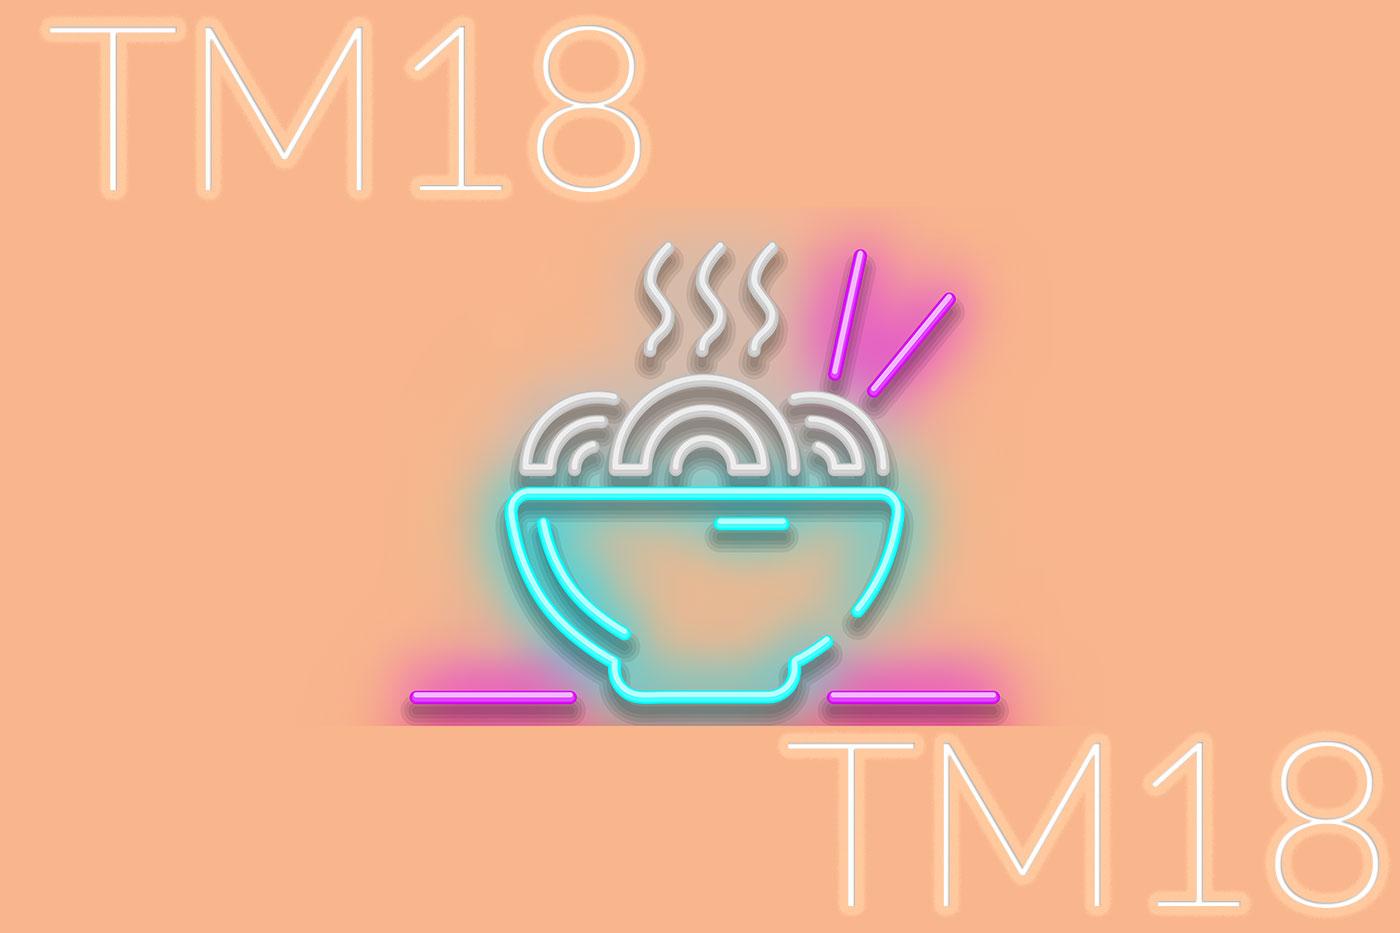 Track: TM18- 160 BPM